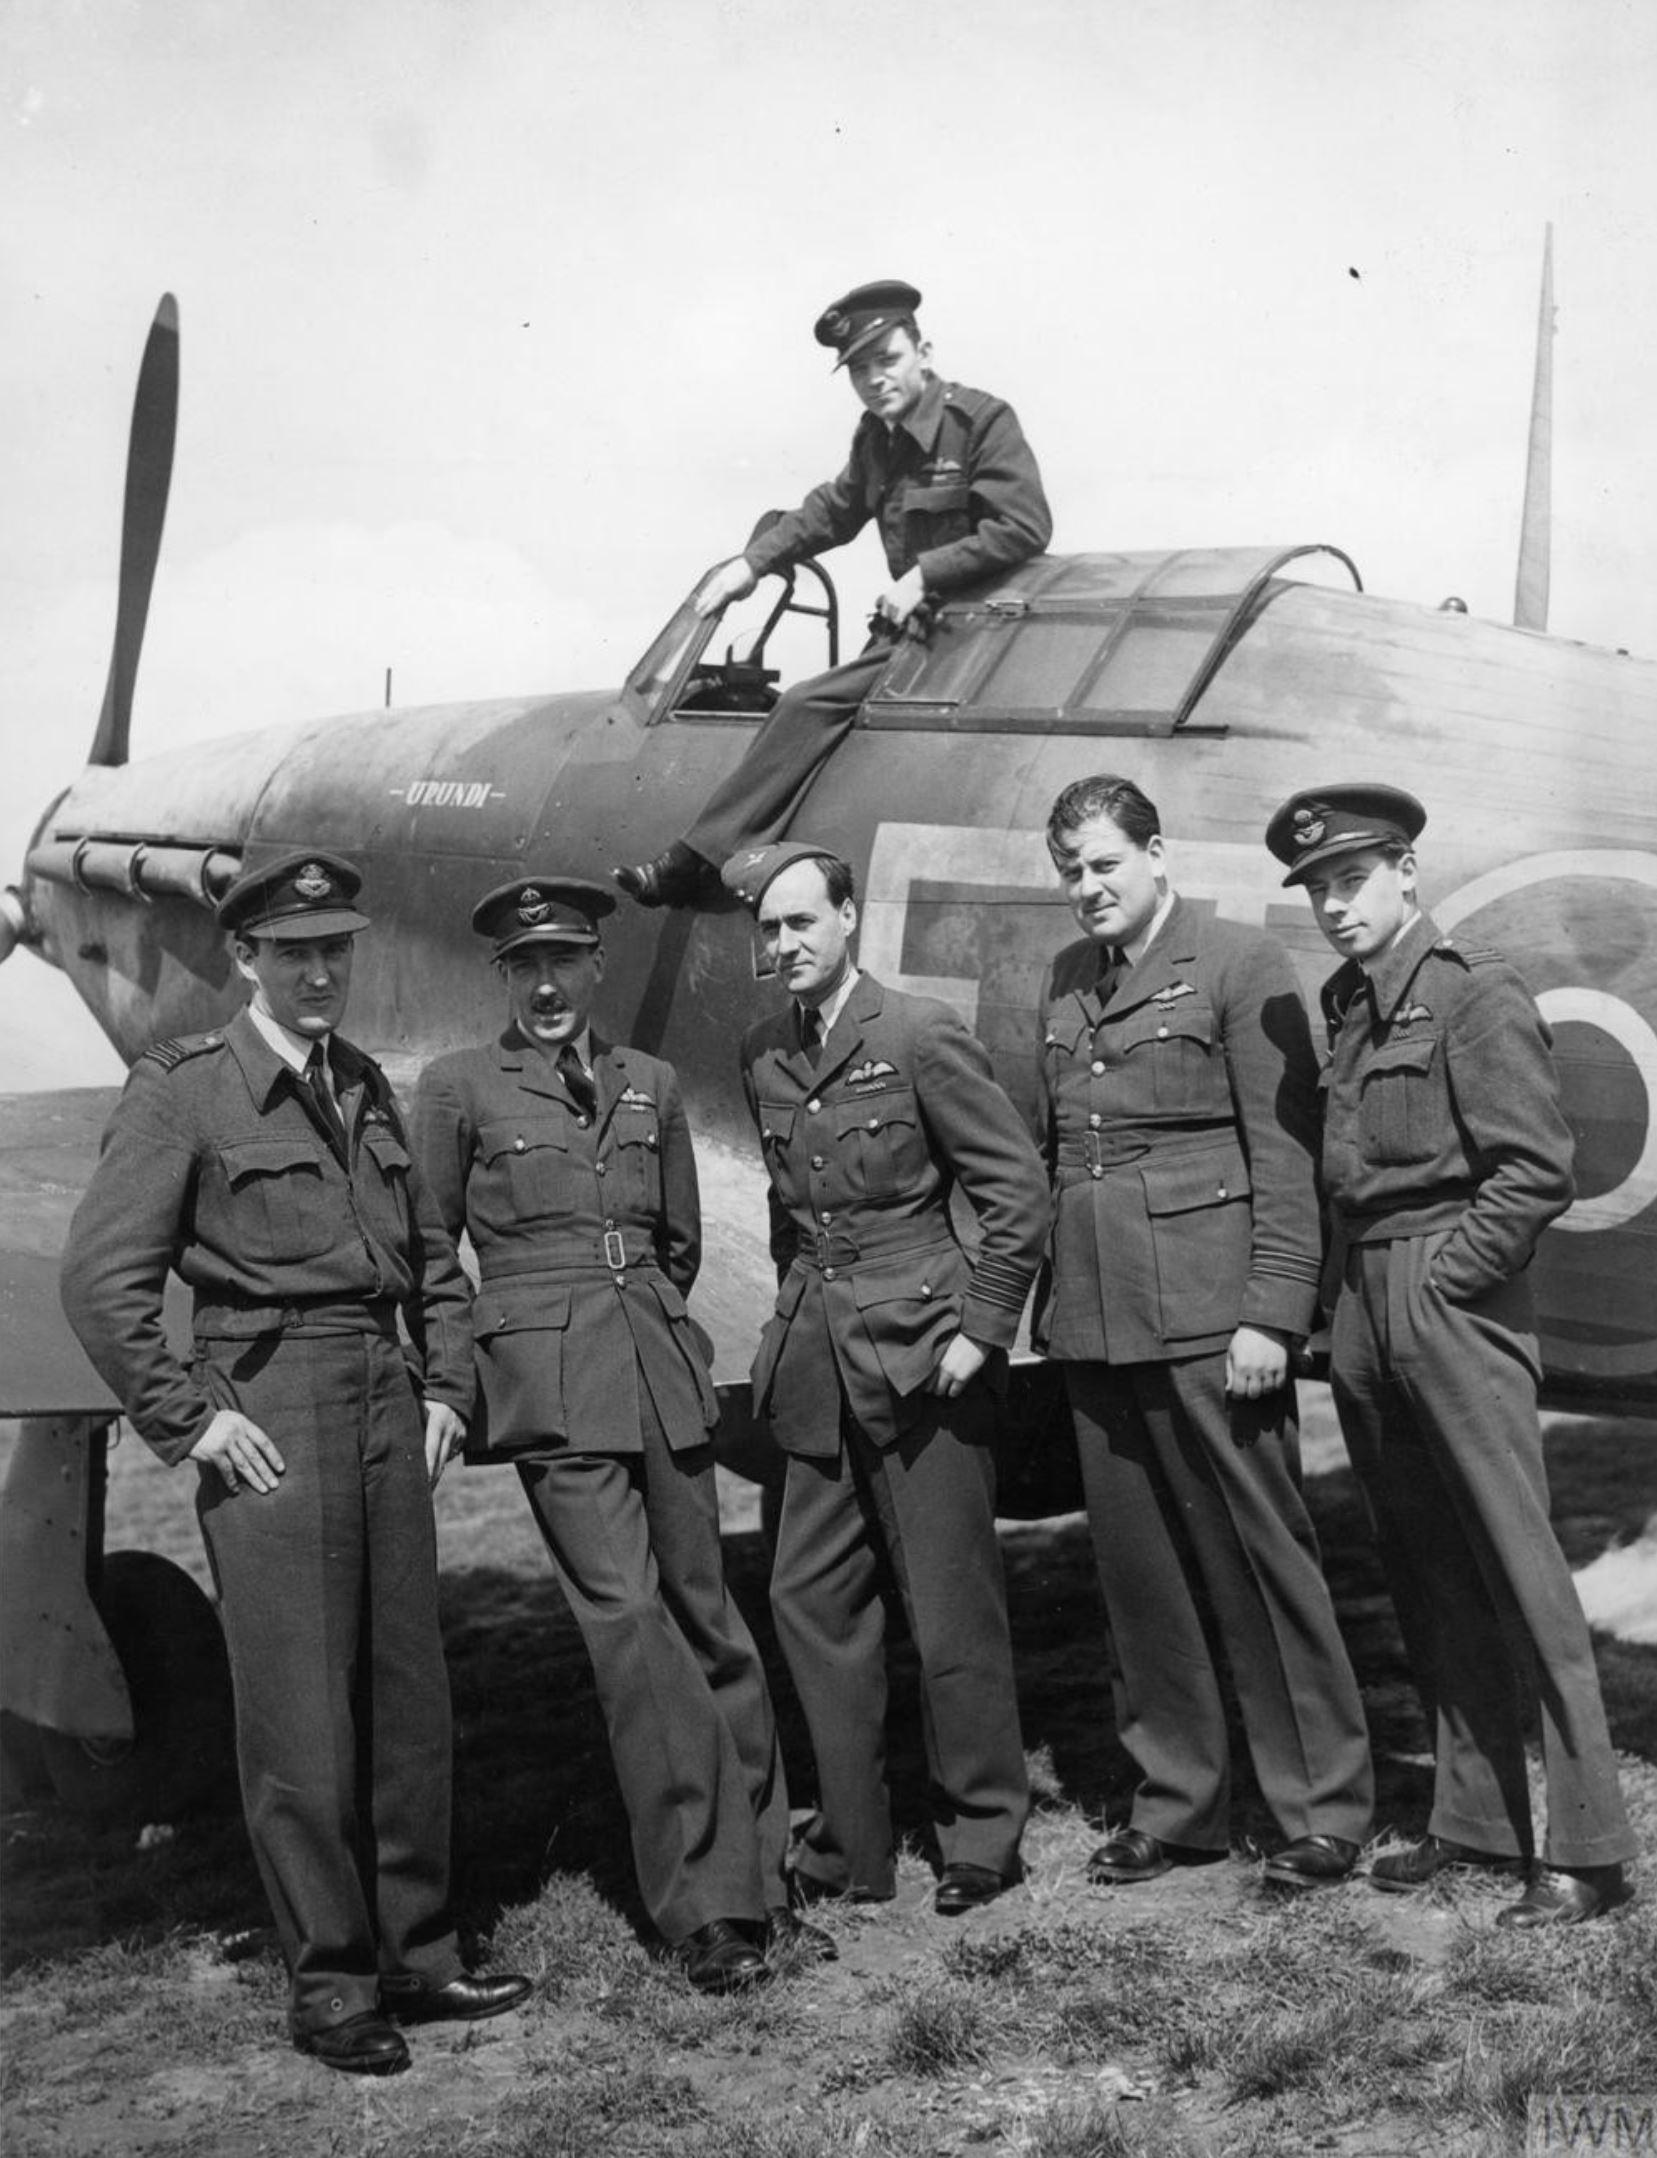 Aircrew RAF Wings during the Dieppe Raid at Tangmere IWM HU88314